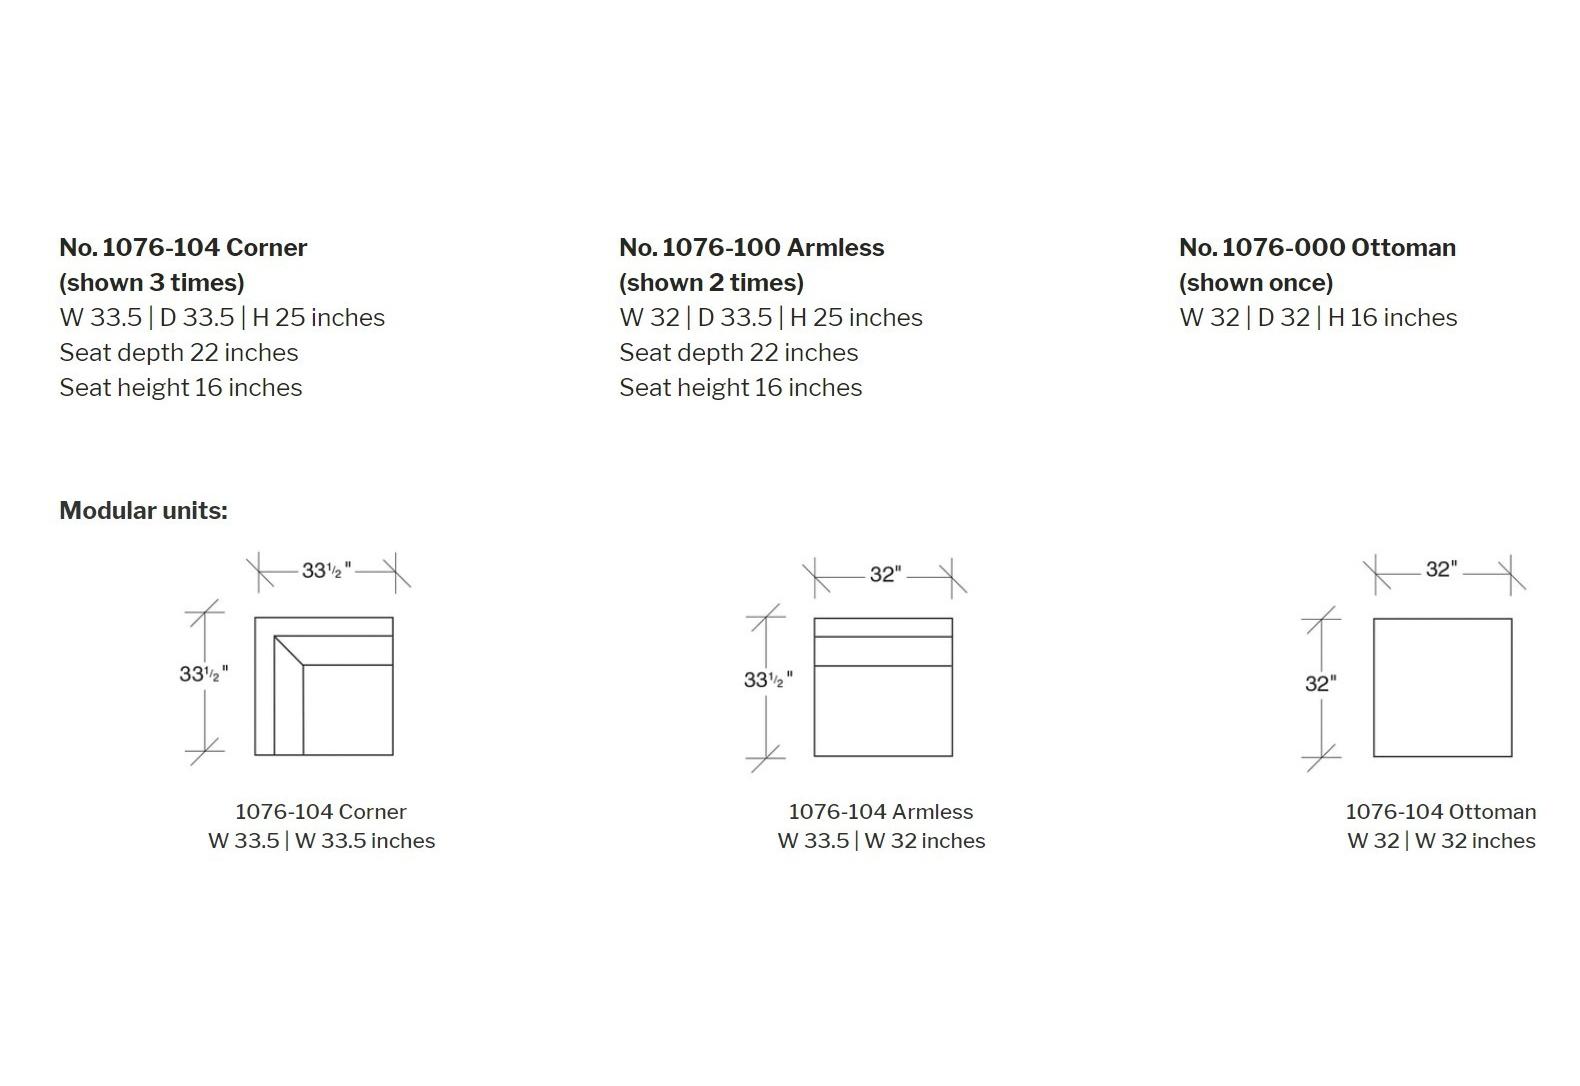 1076-mod-units.jpg